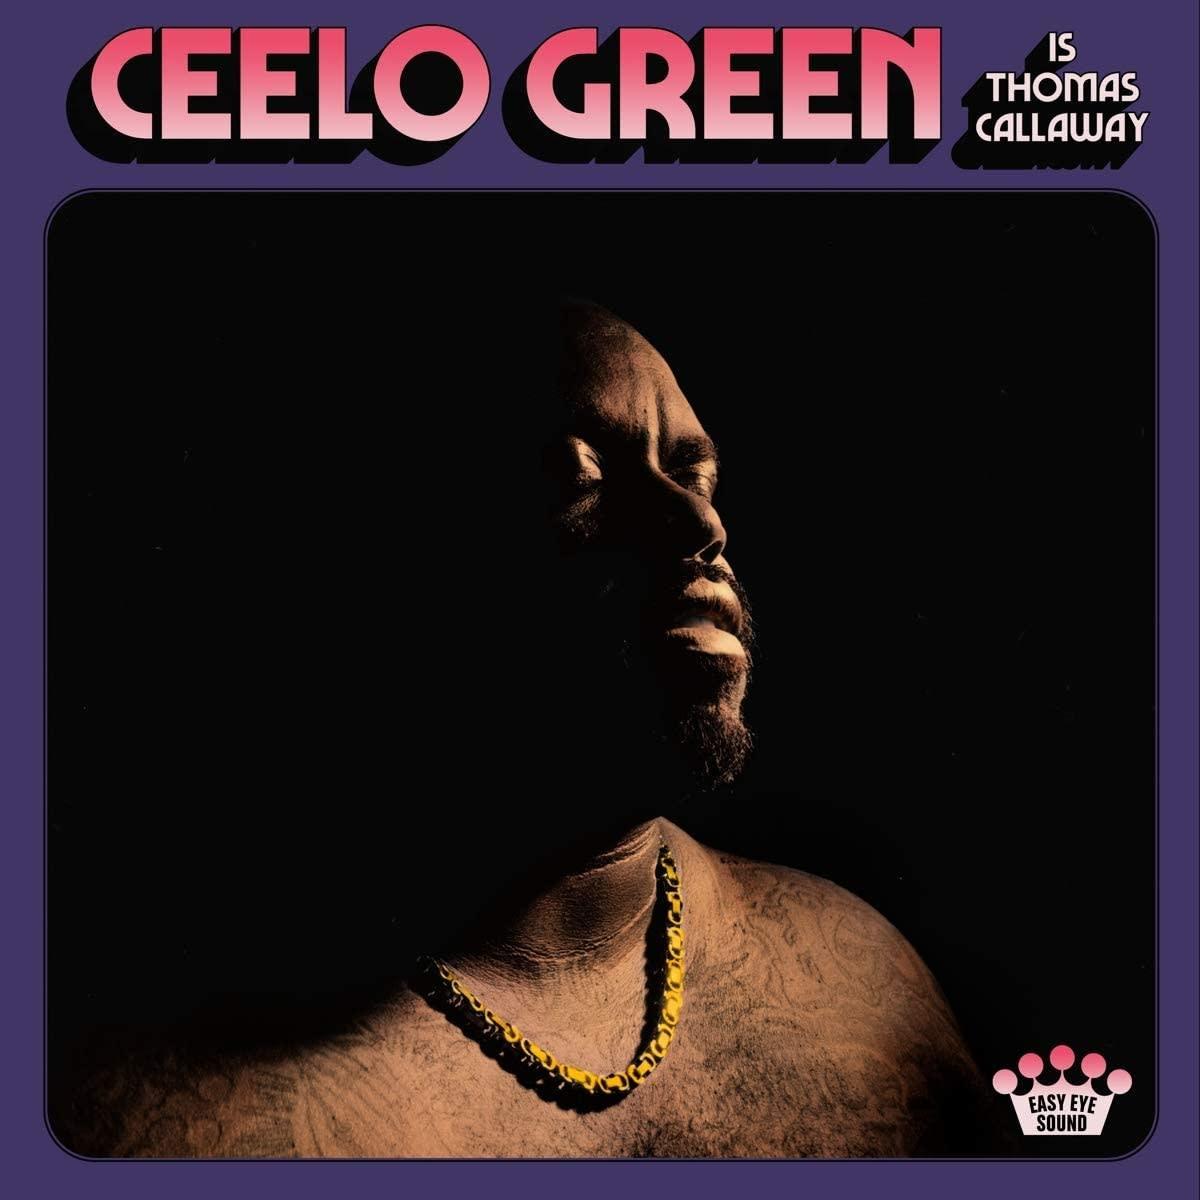 CeeLo Green – Ceelo Green Is Thomas Callaway